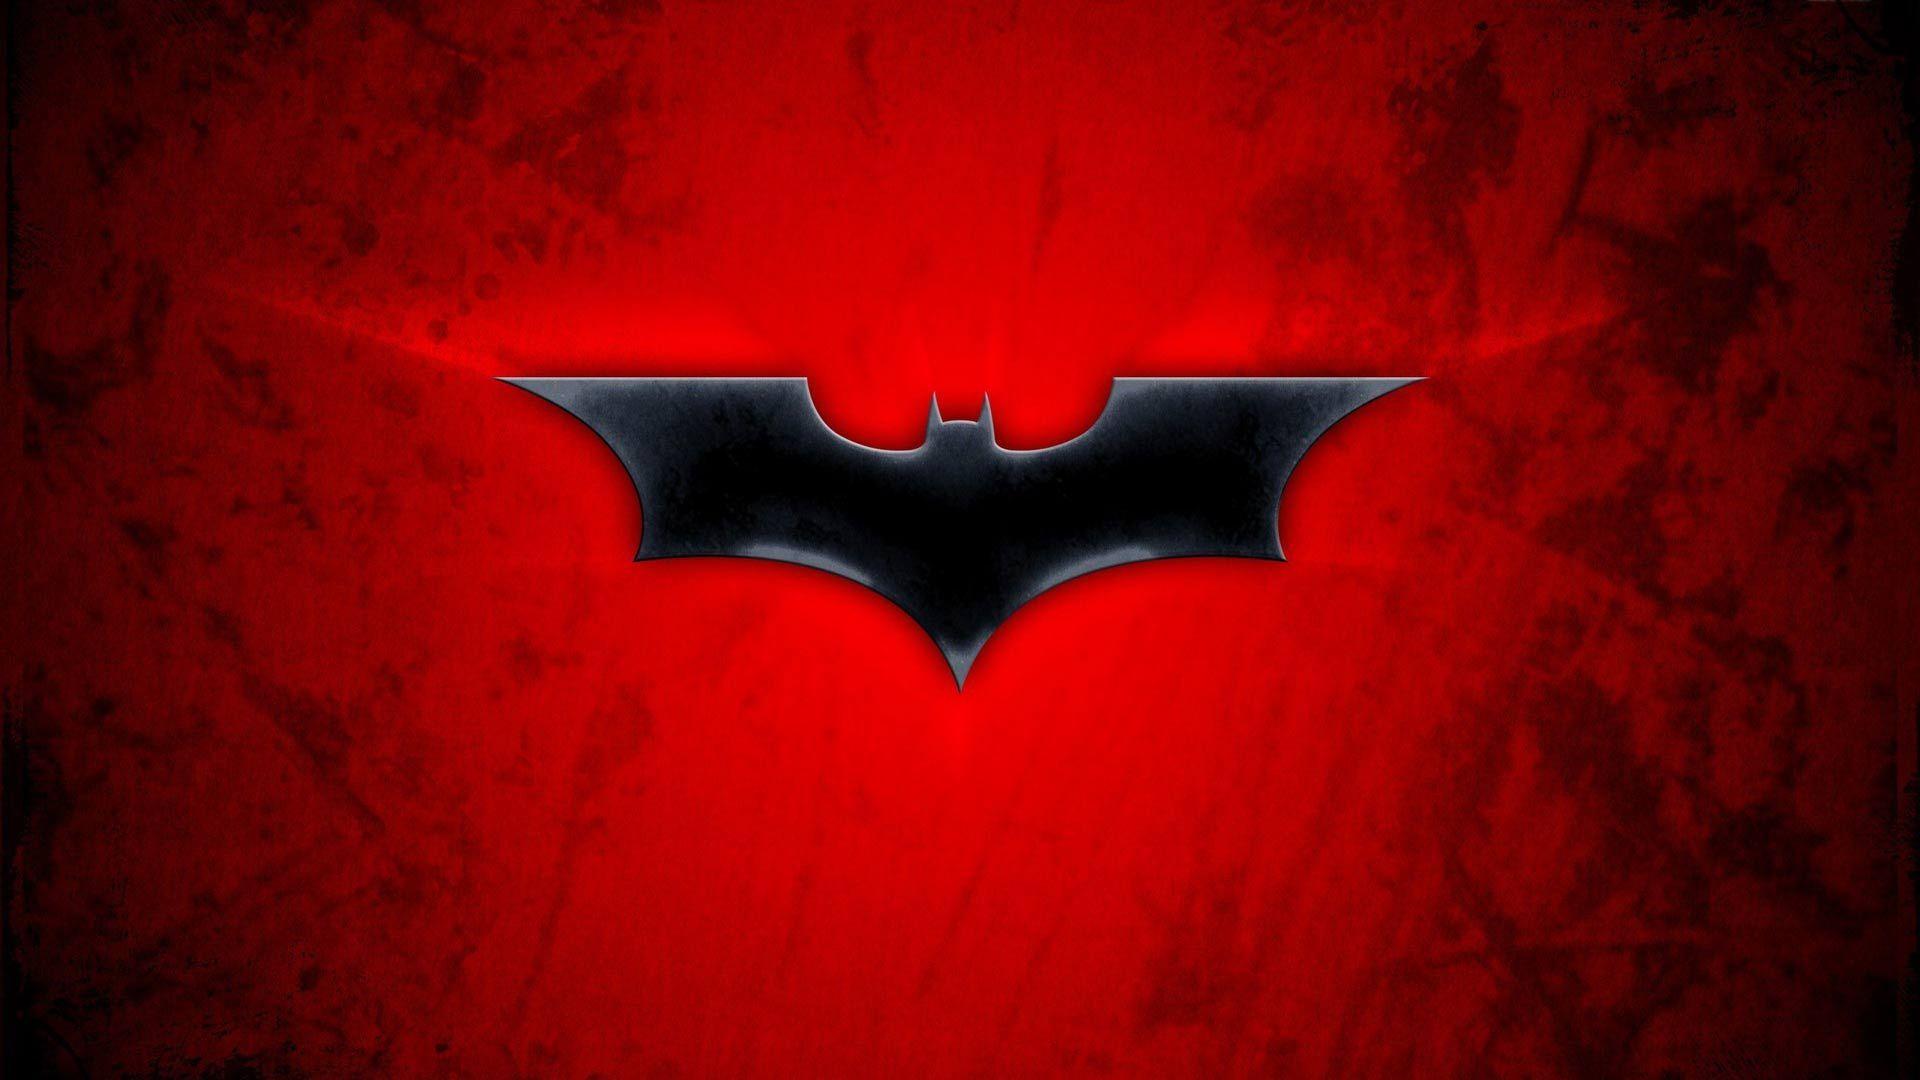 Batman Red Movie Wallpaper Red Batman Batman Wallpaper Logo Wallpaper Hd